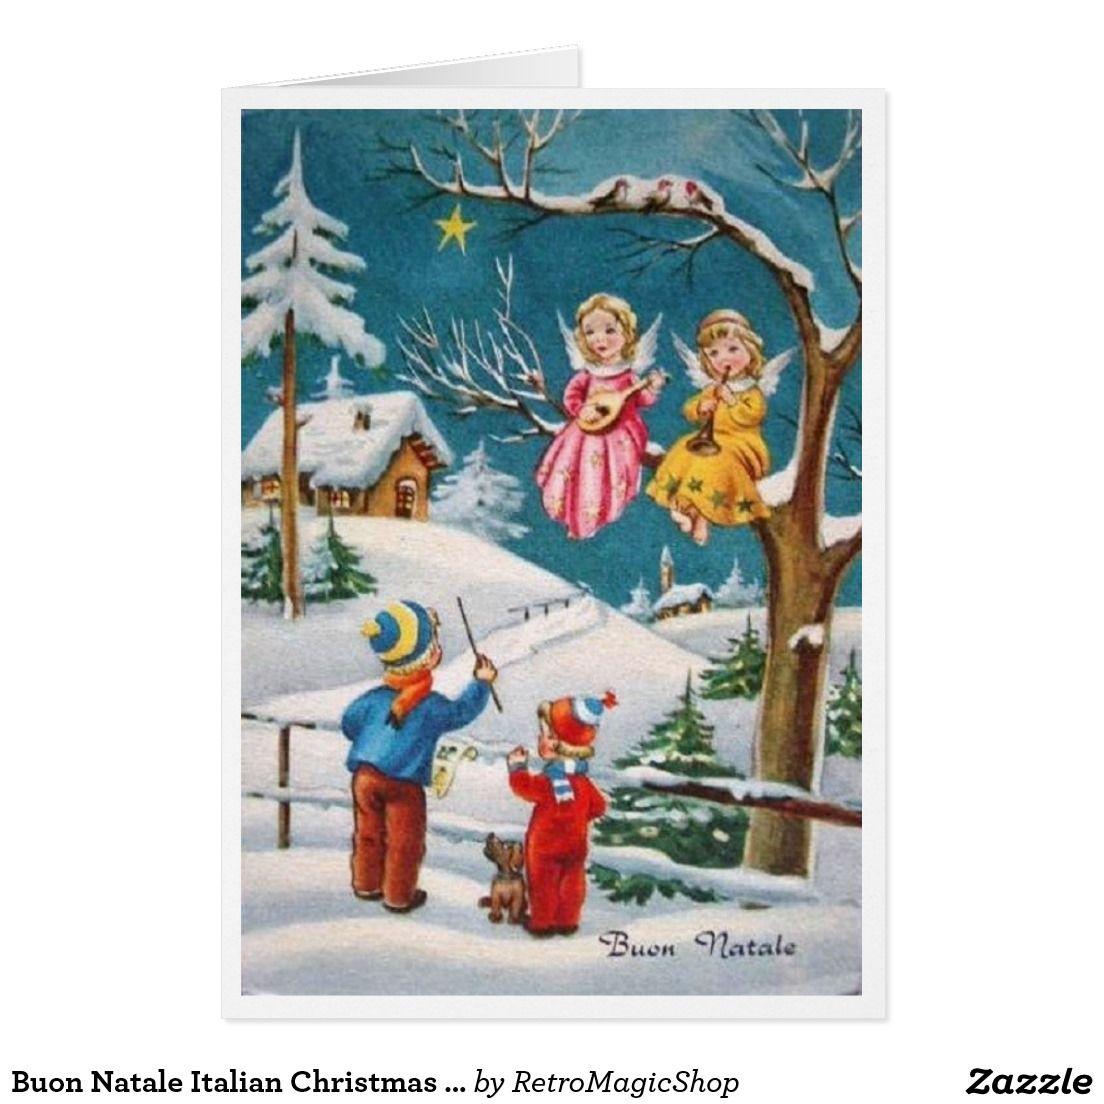 Buon natale italian christmas card italian christmas natale and buon natale italian christmas card italian christmas natale and custom christmas cards kristyandbryce Images